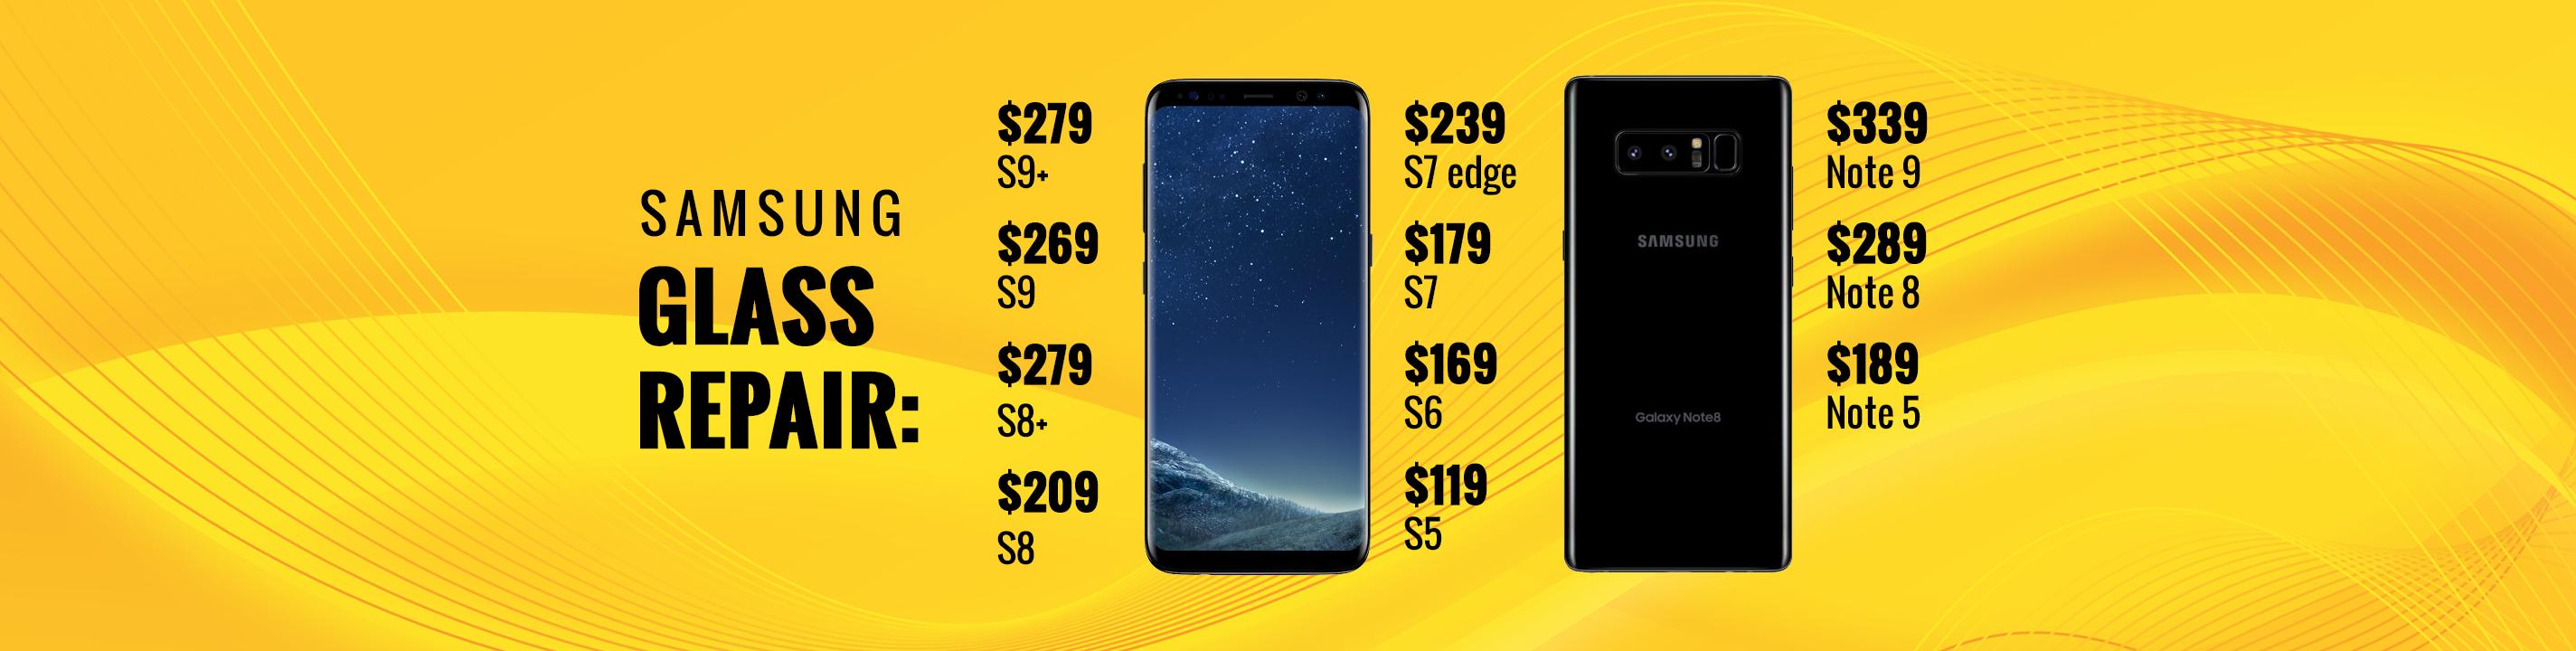 samsung-pricing-banner-1.8.19